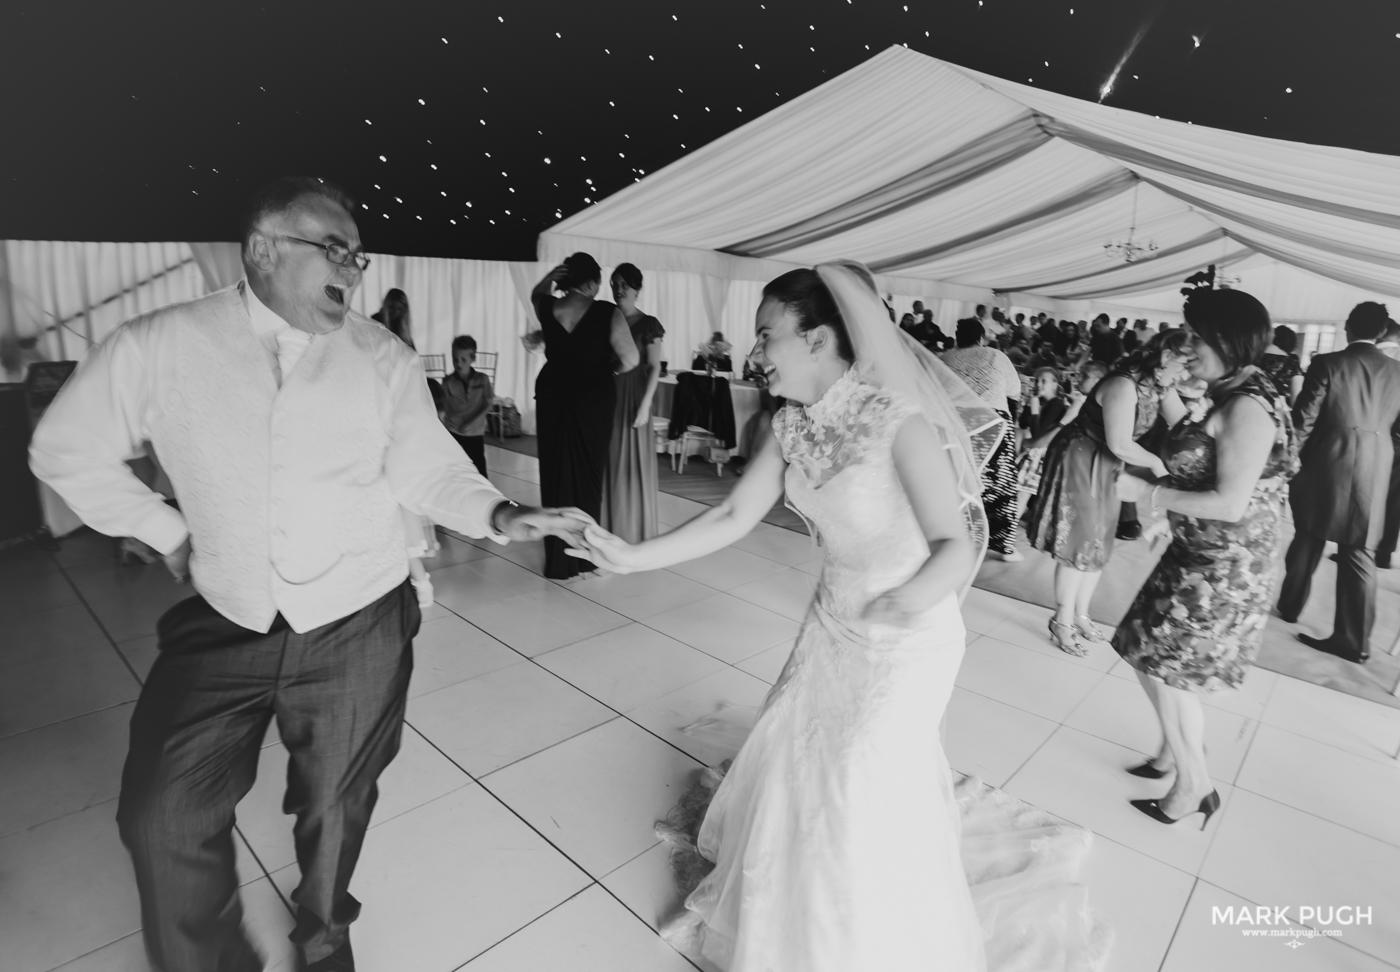 203- Laura and Peter - Wollaton Hall Wedding Nottingham UK by Mark Pugh www.markpugh.com.jpg